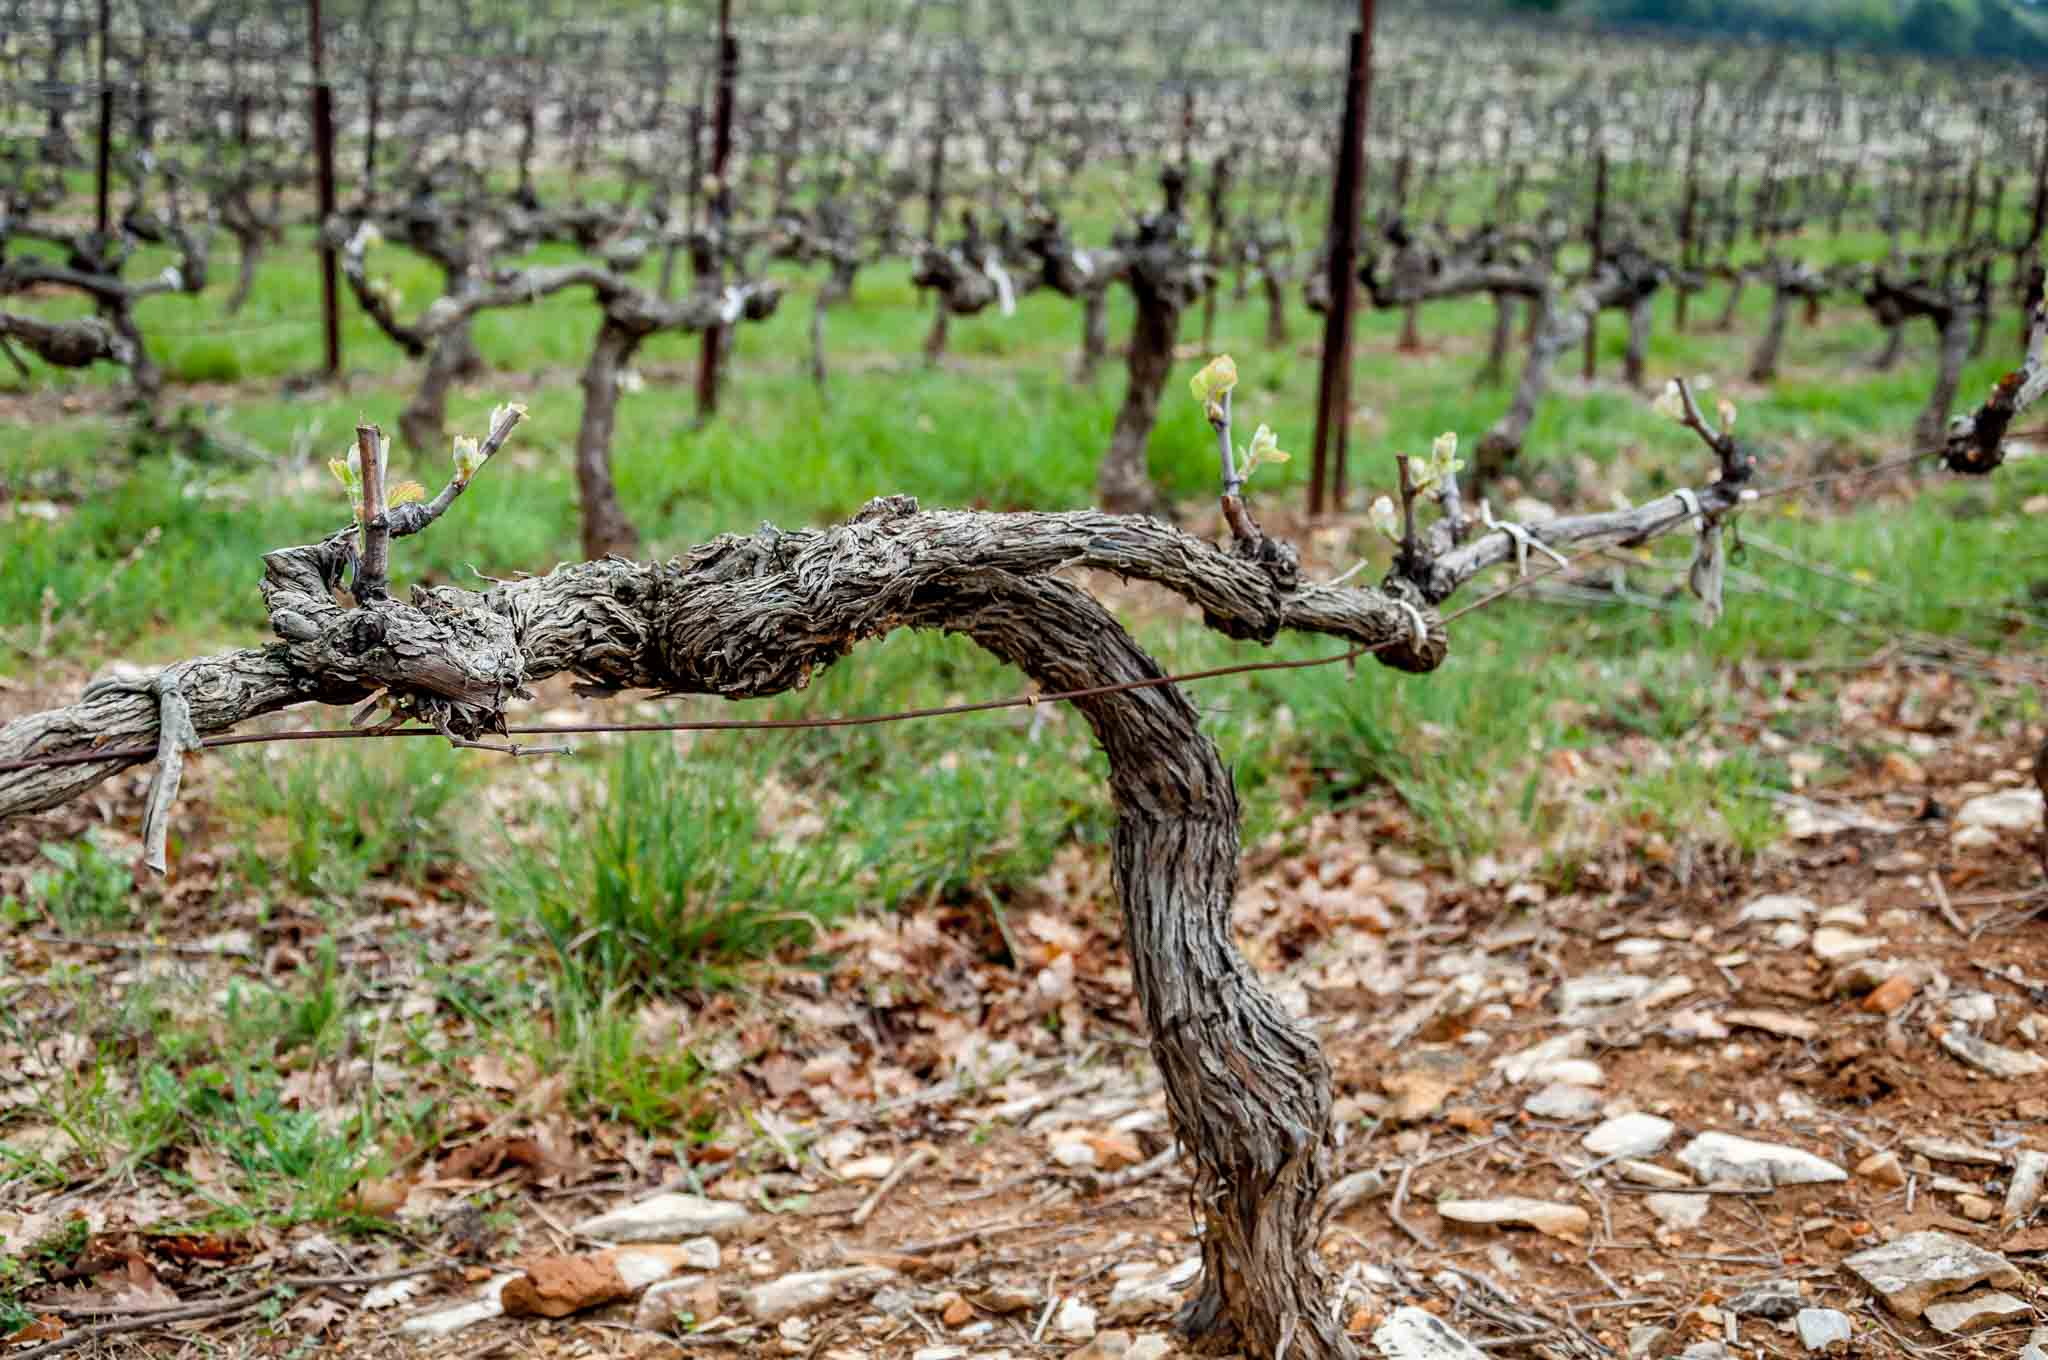 Vineyards in the Cotes du Rhone region of France